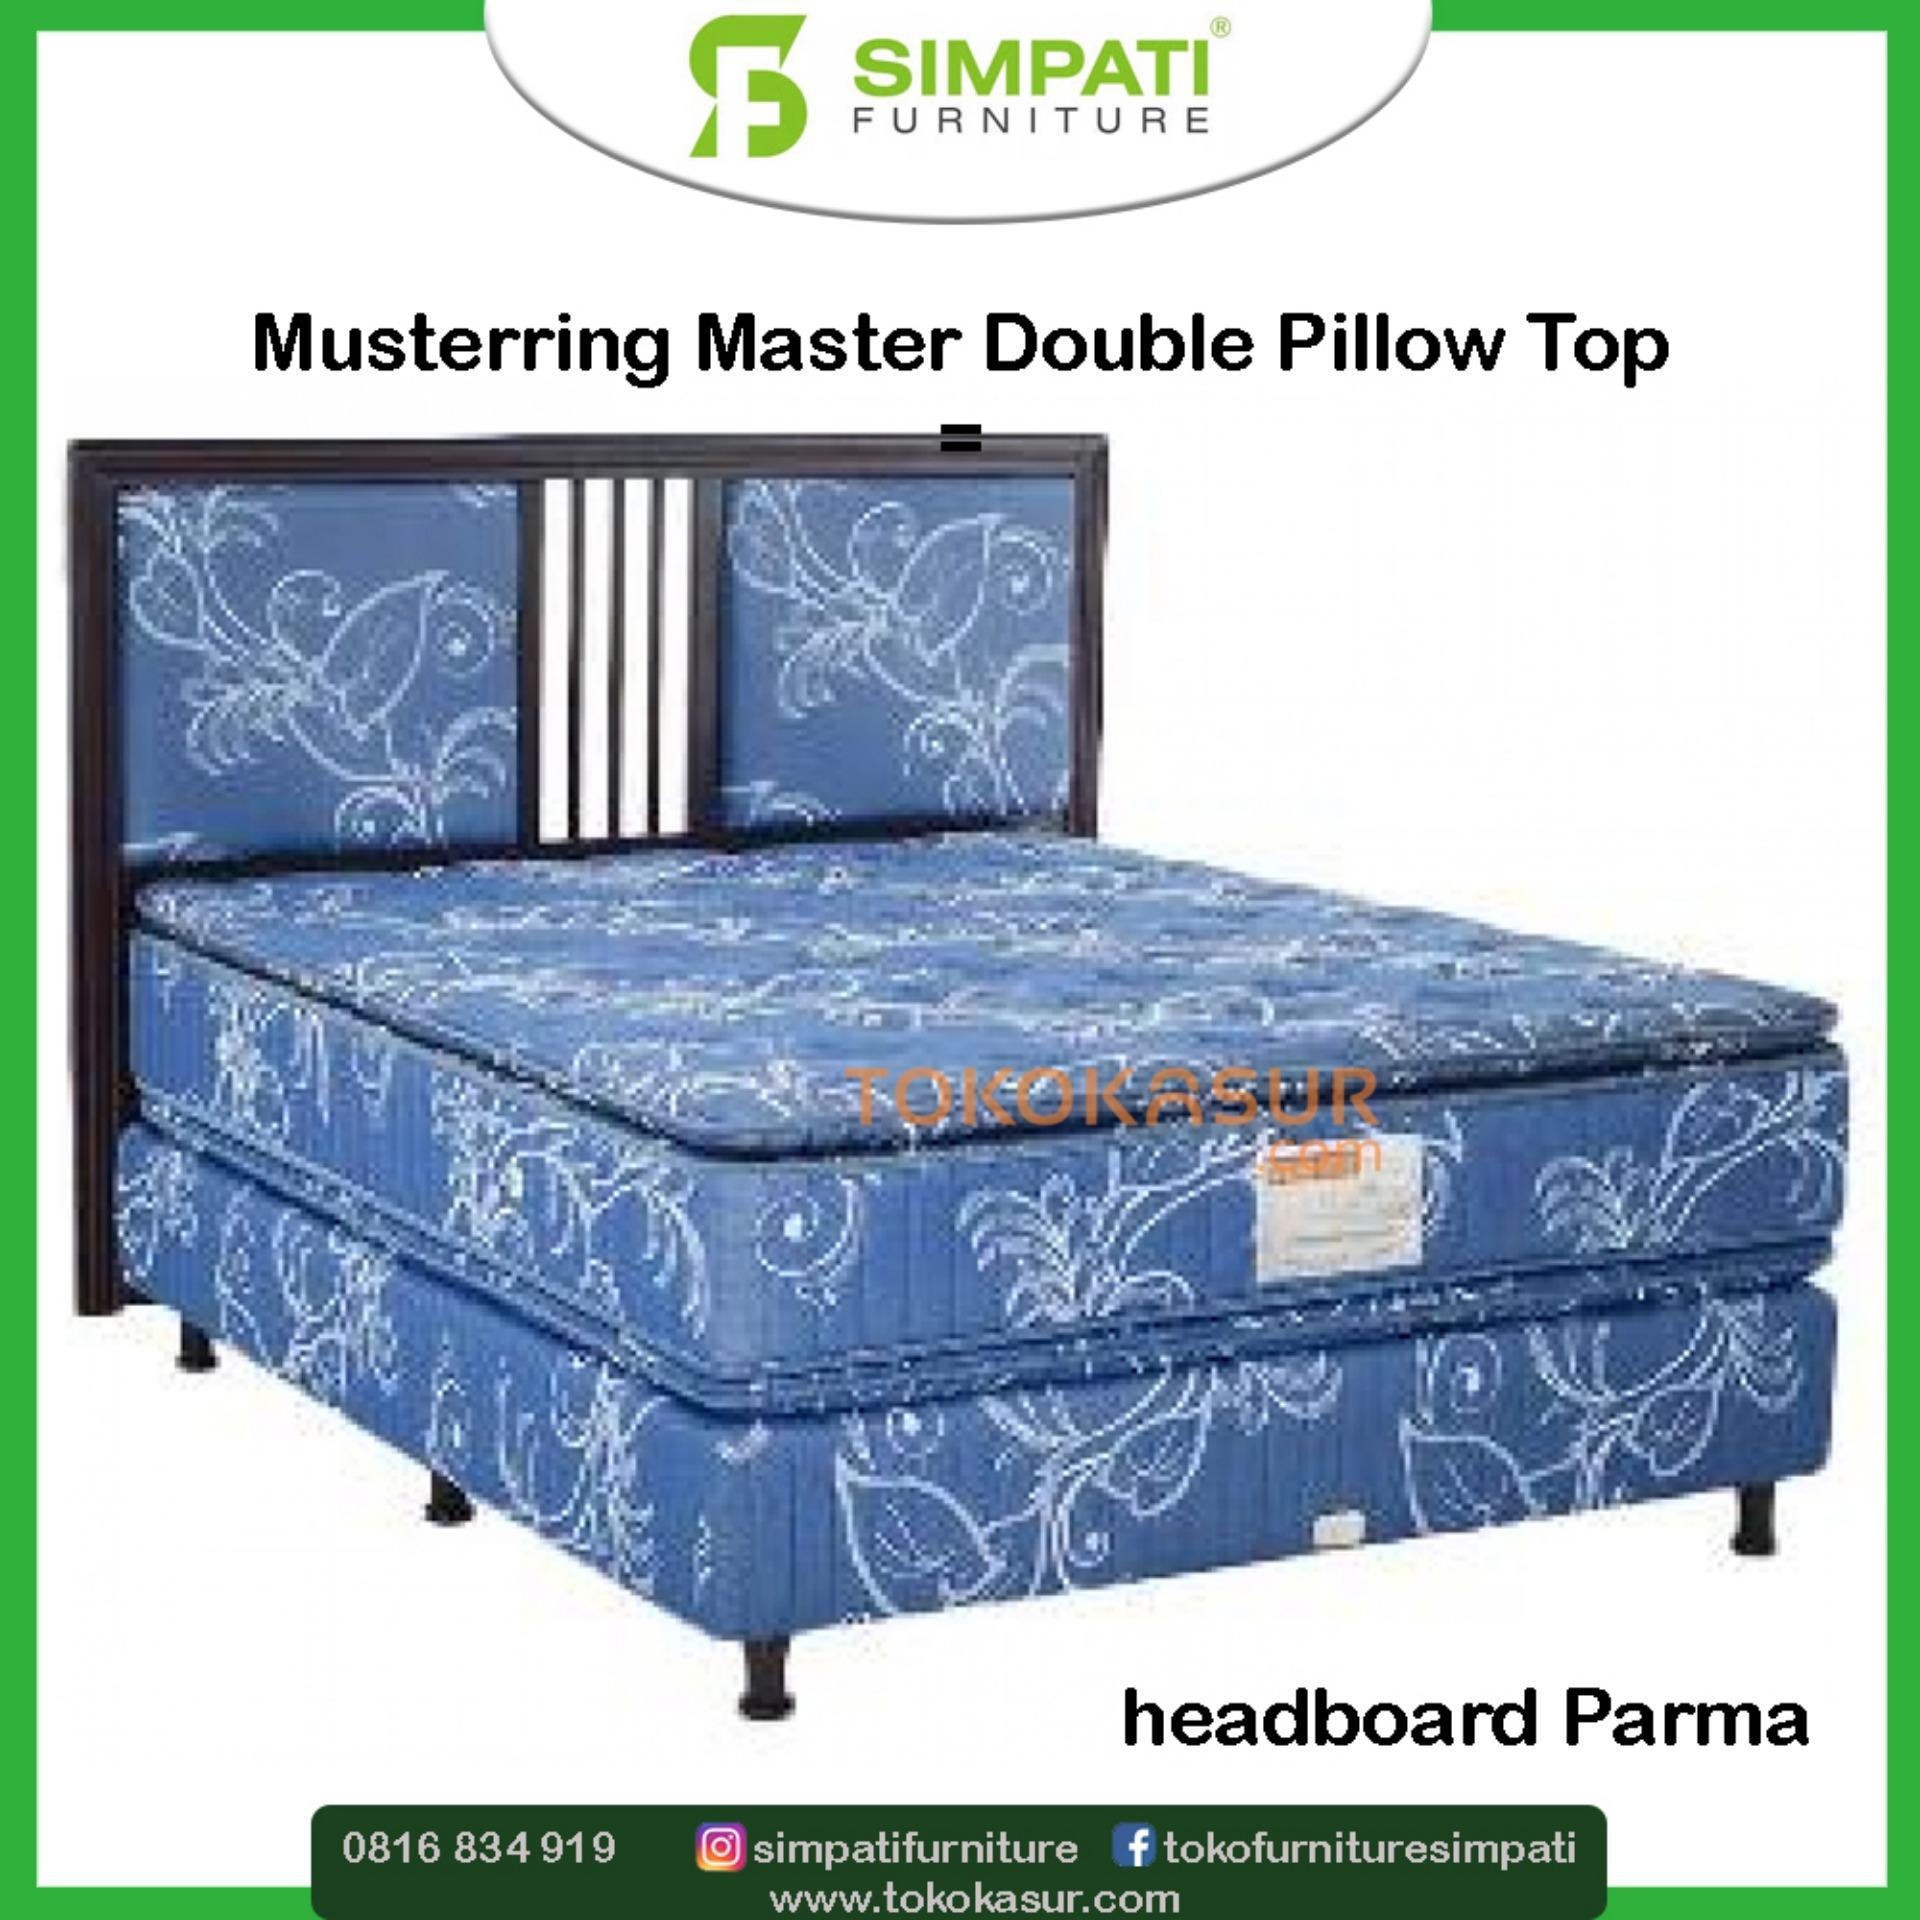 Musterring Master Double Pillowtop 160x200 Komplit Set Parma